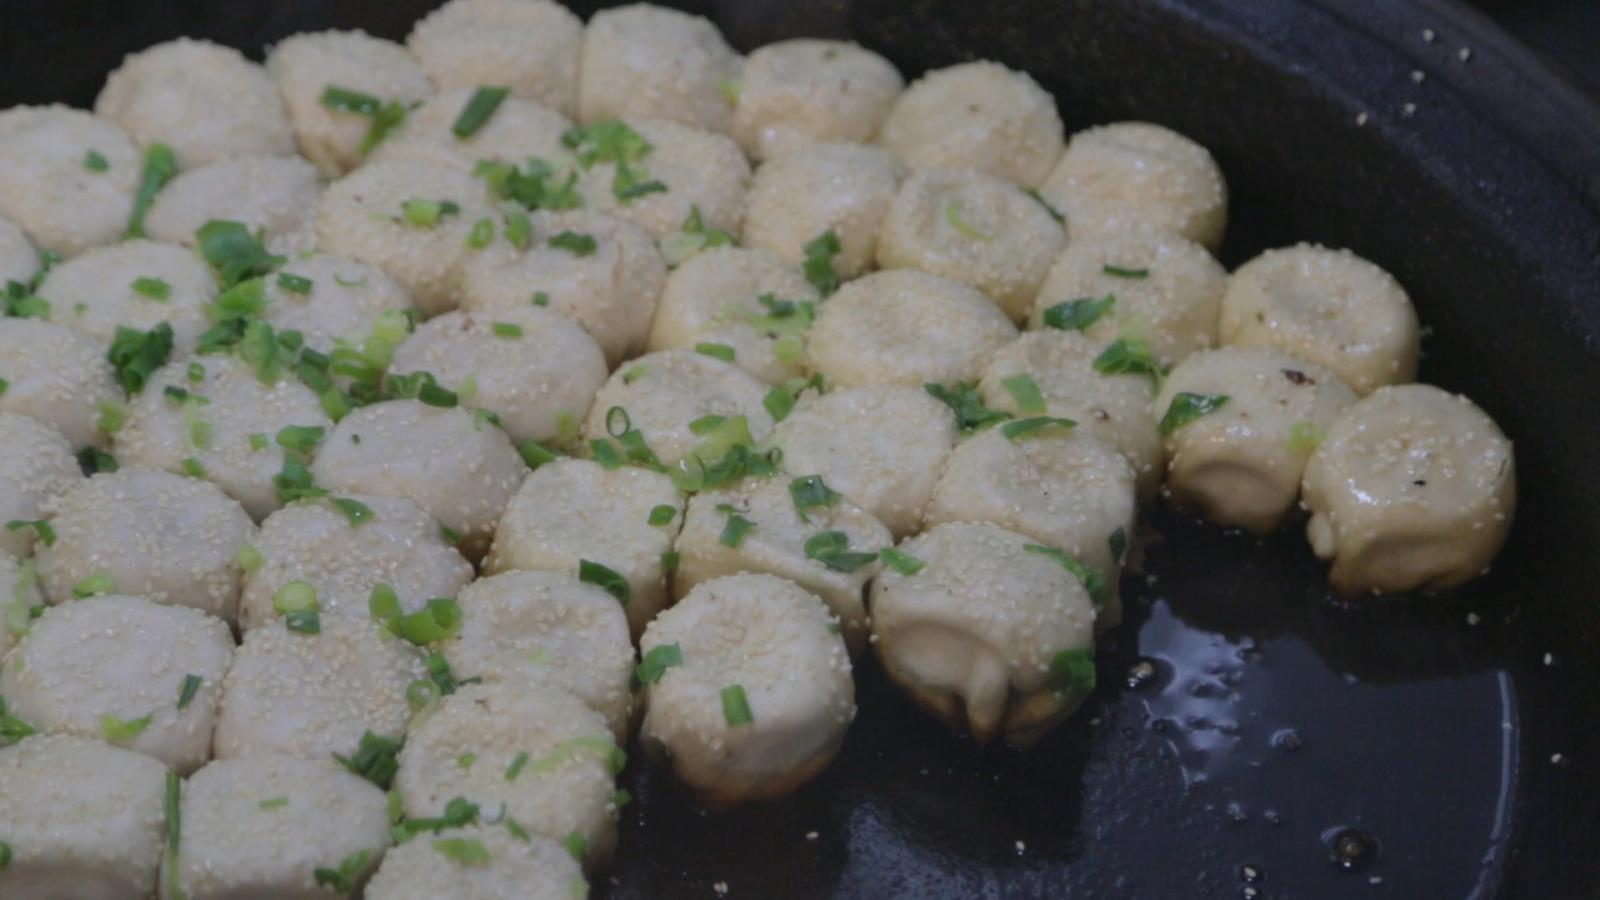 Yang S Fried Dumplings Black Buddha